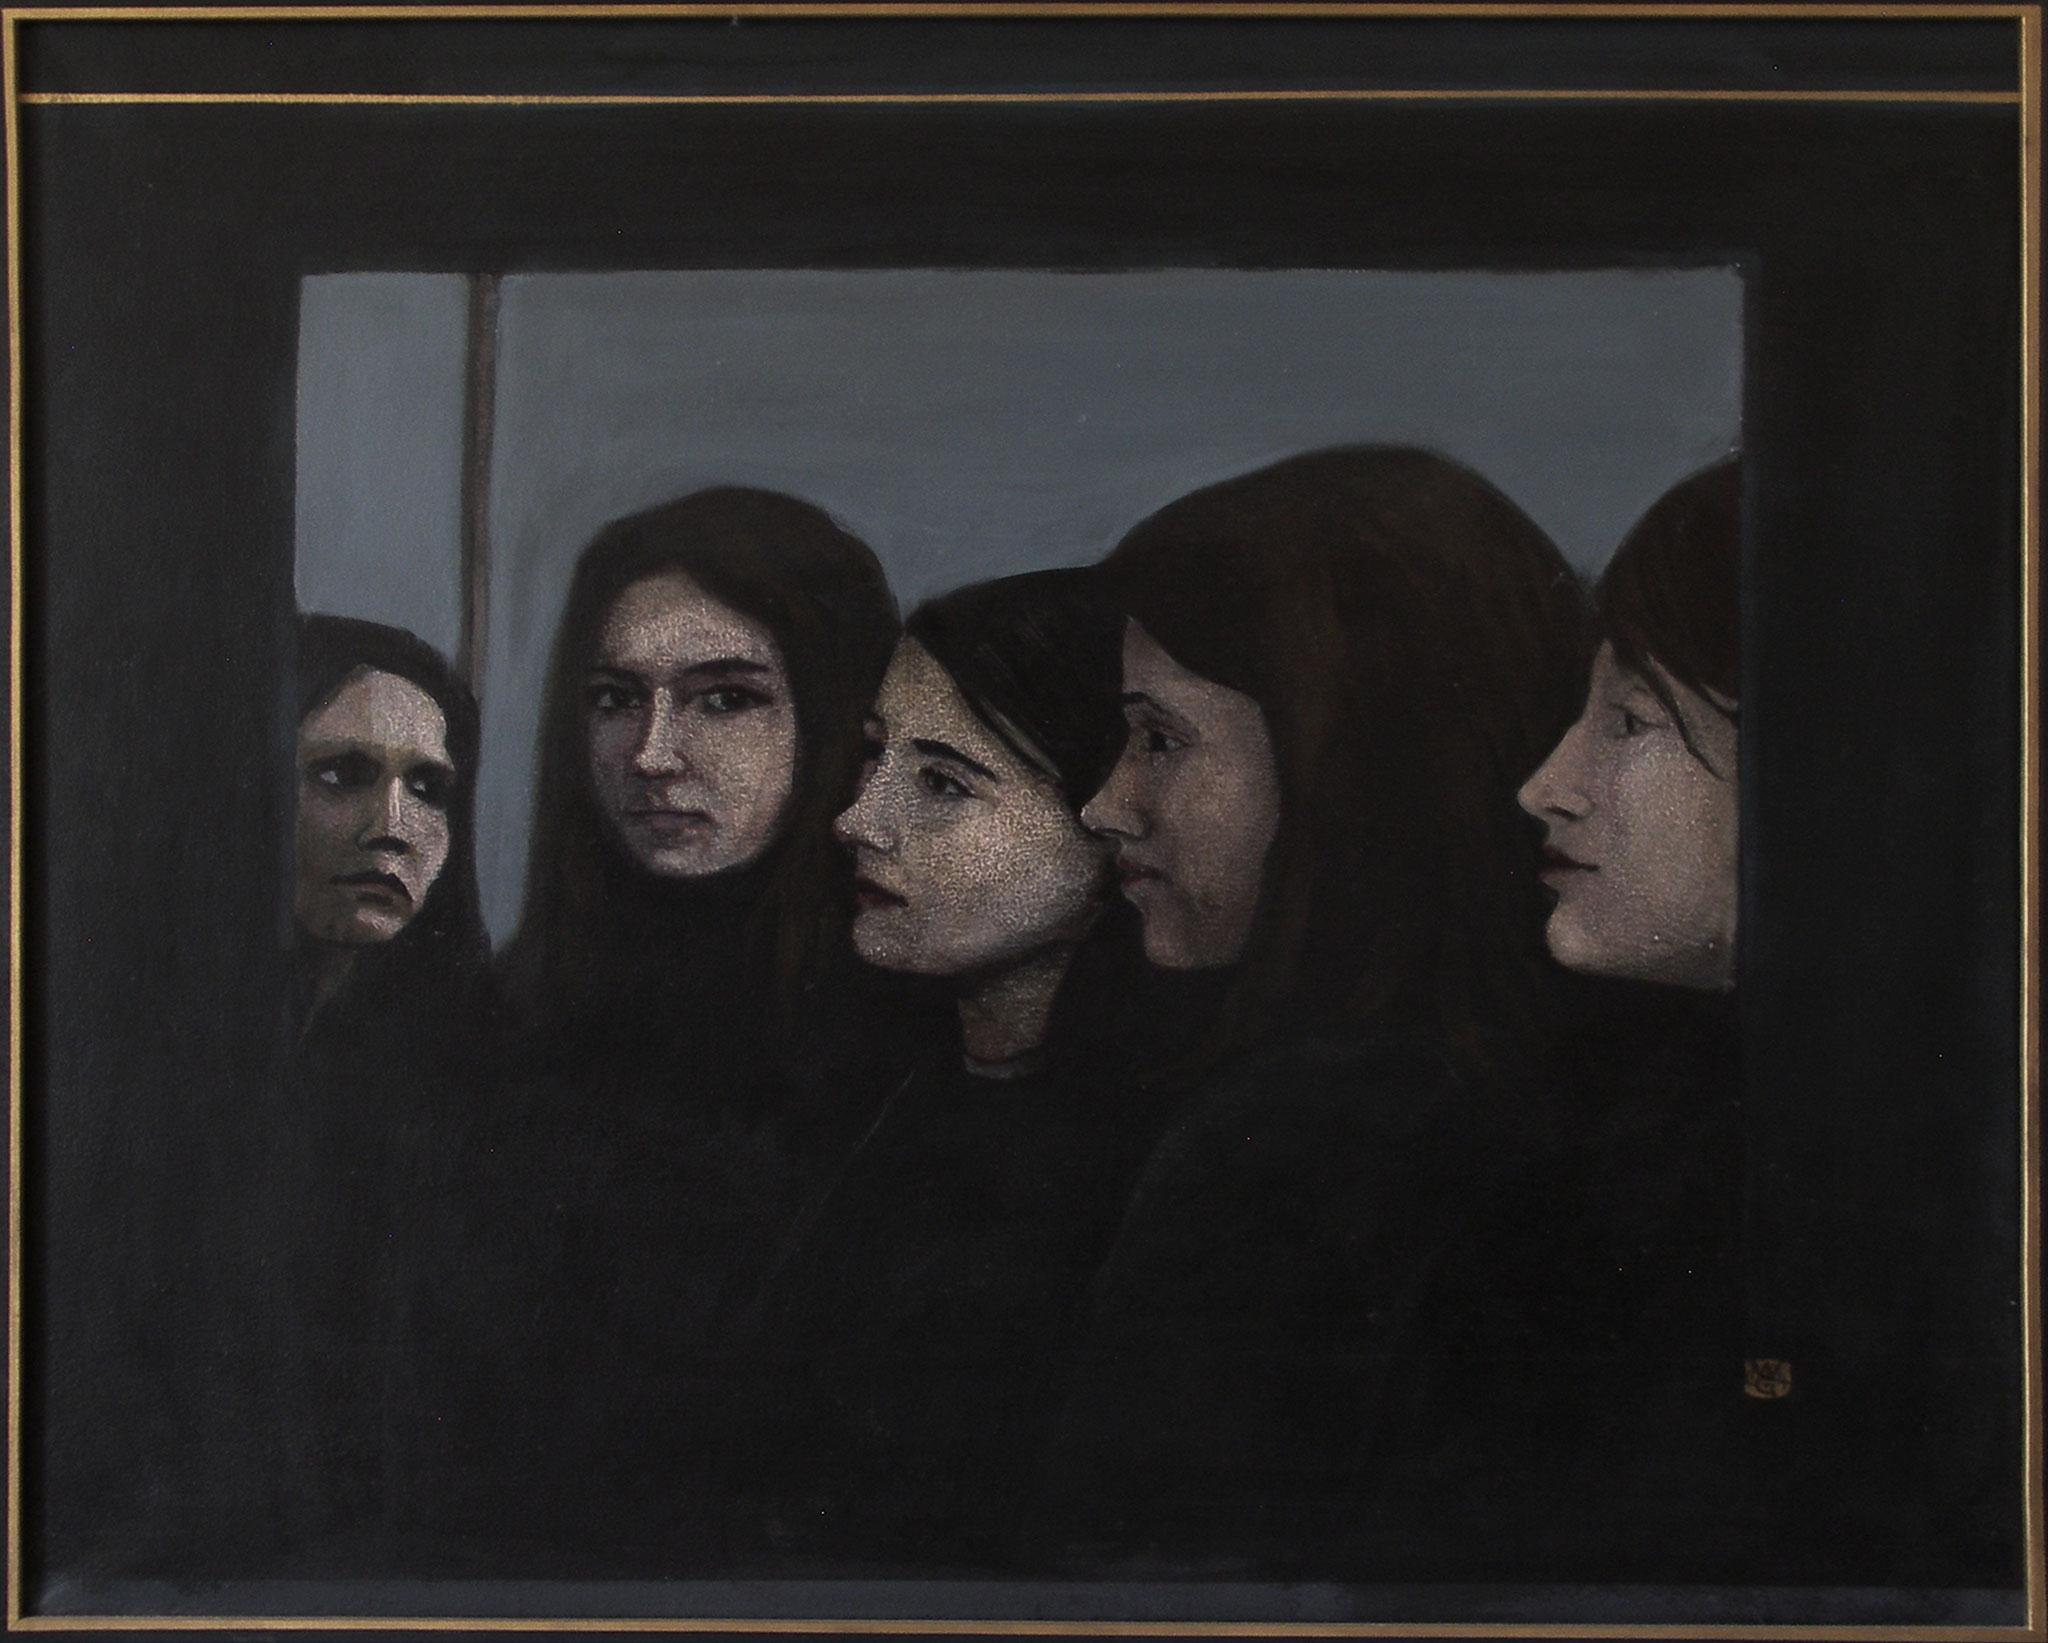 """Fünf Köpfe"", Acryl auf Leinwand, 60x70, 2004"